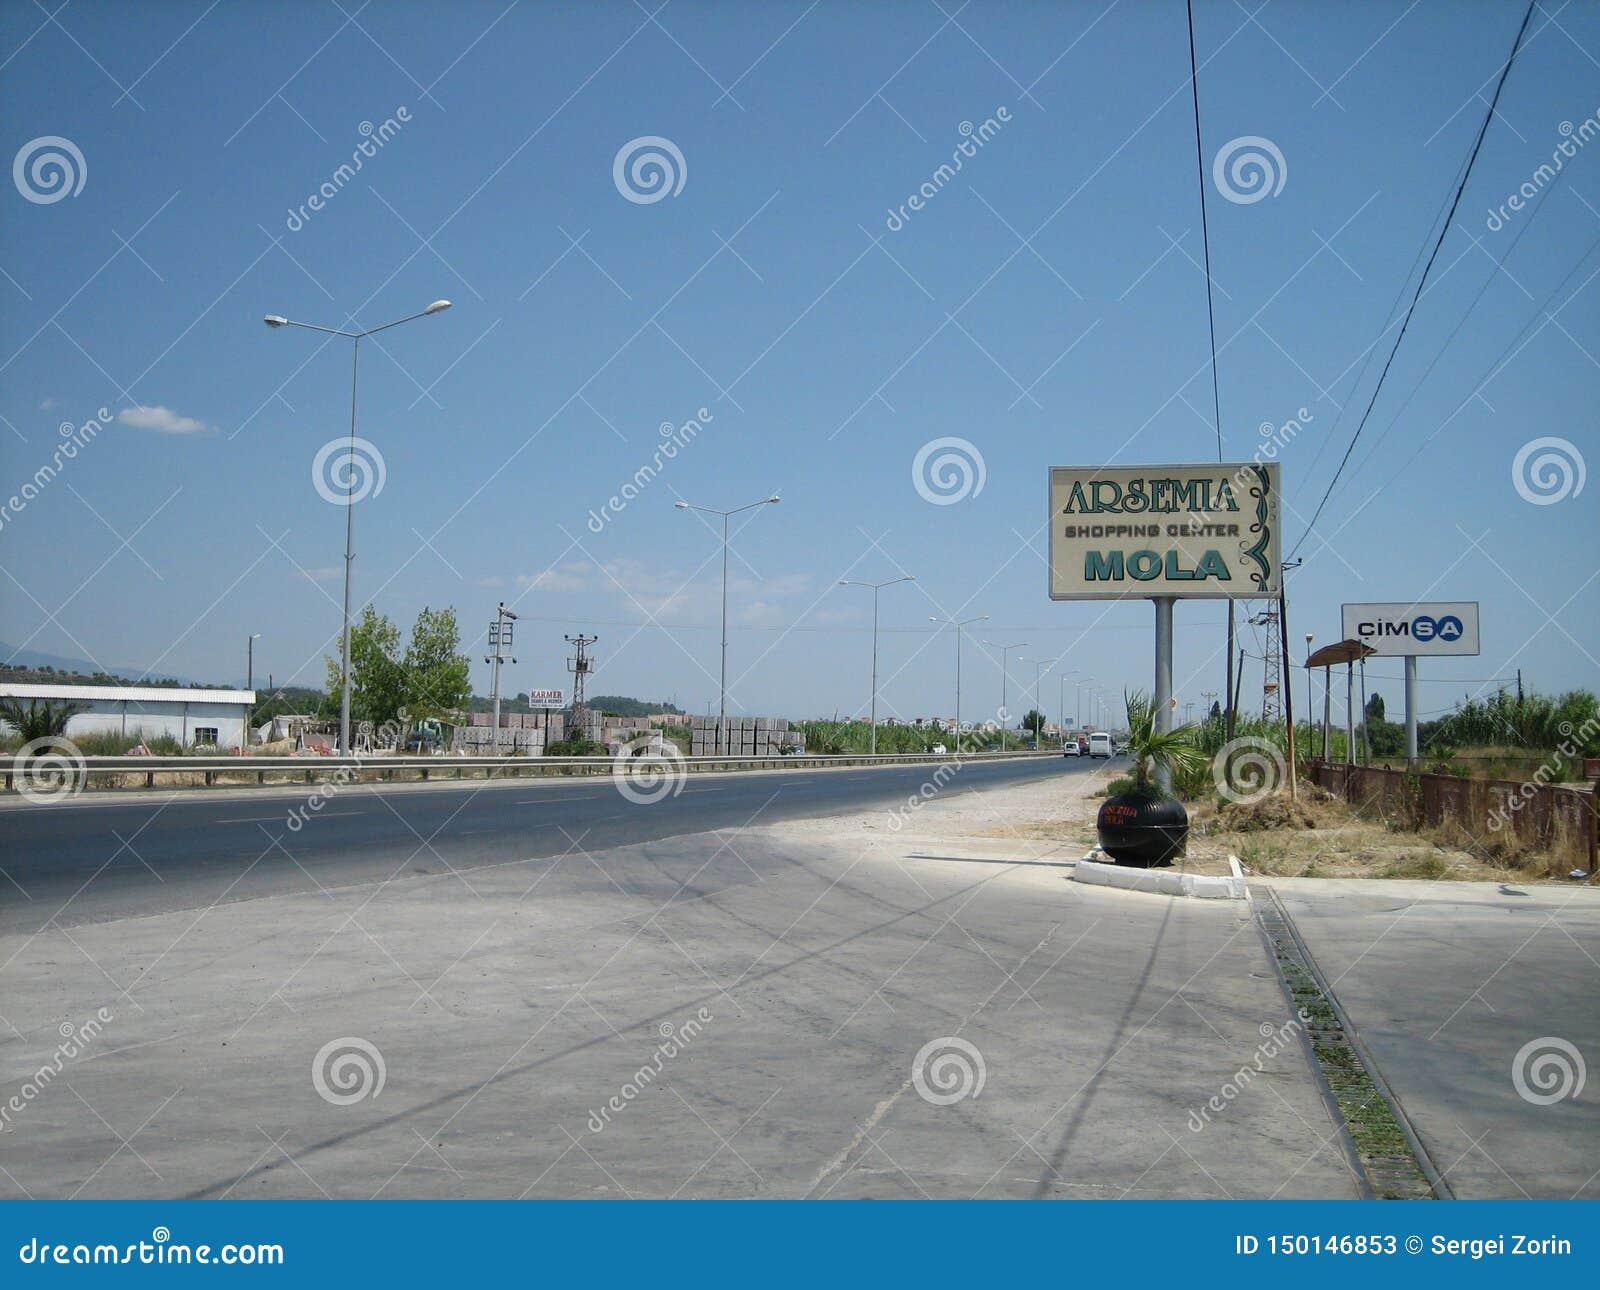 Vlotte asfaltweg van blauwe kleur onder de blauwe hemel